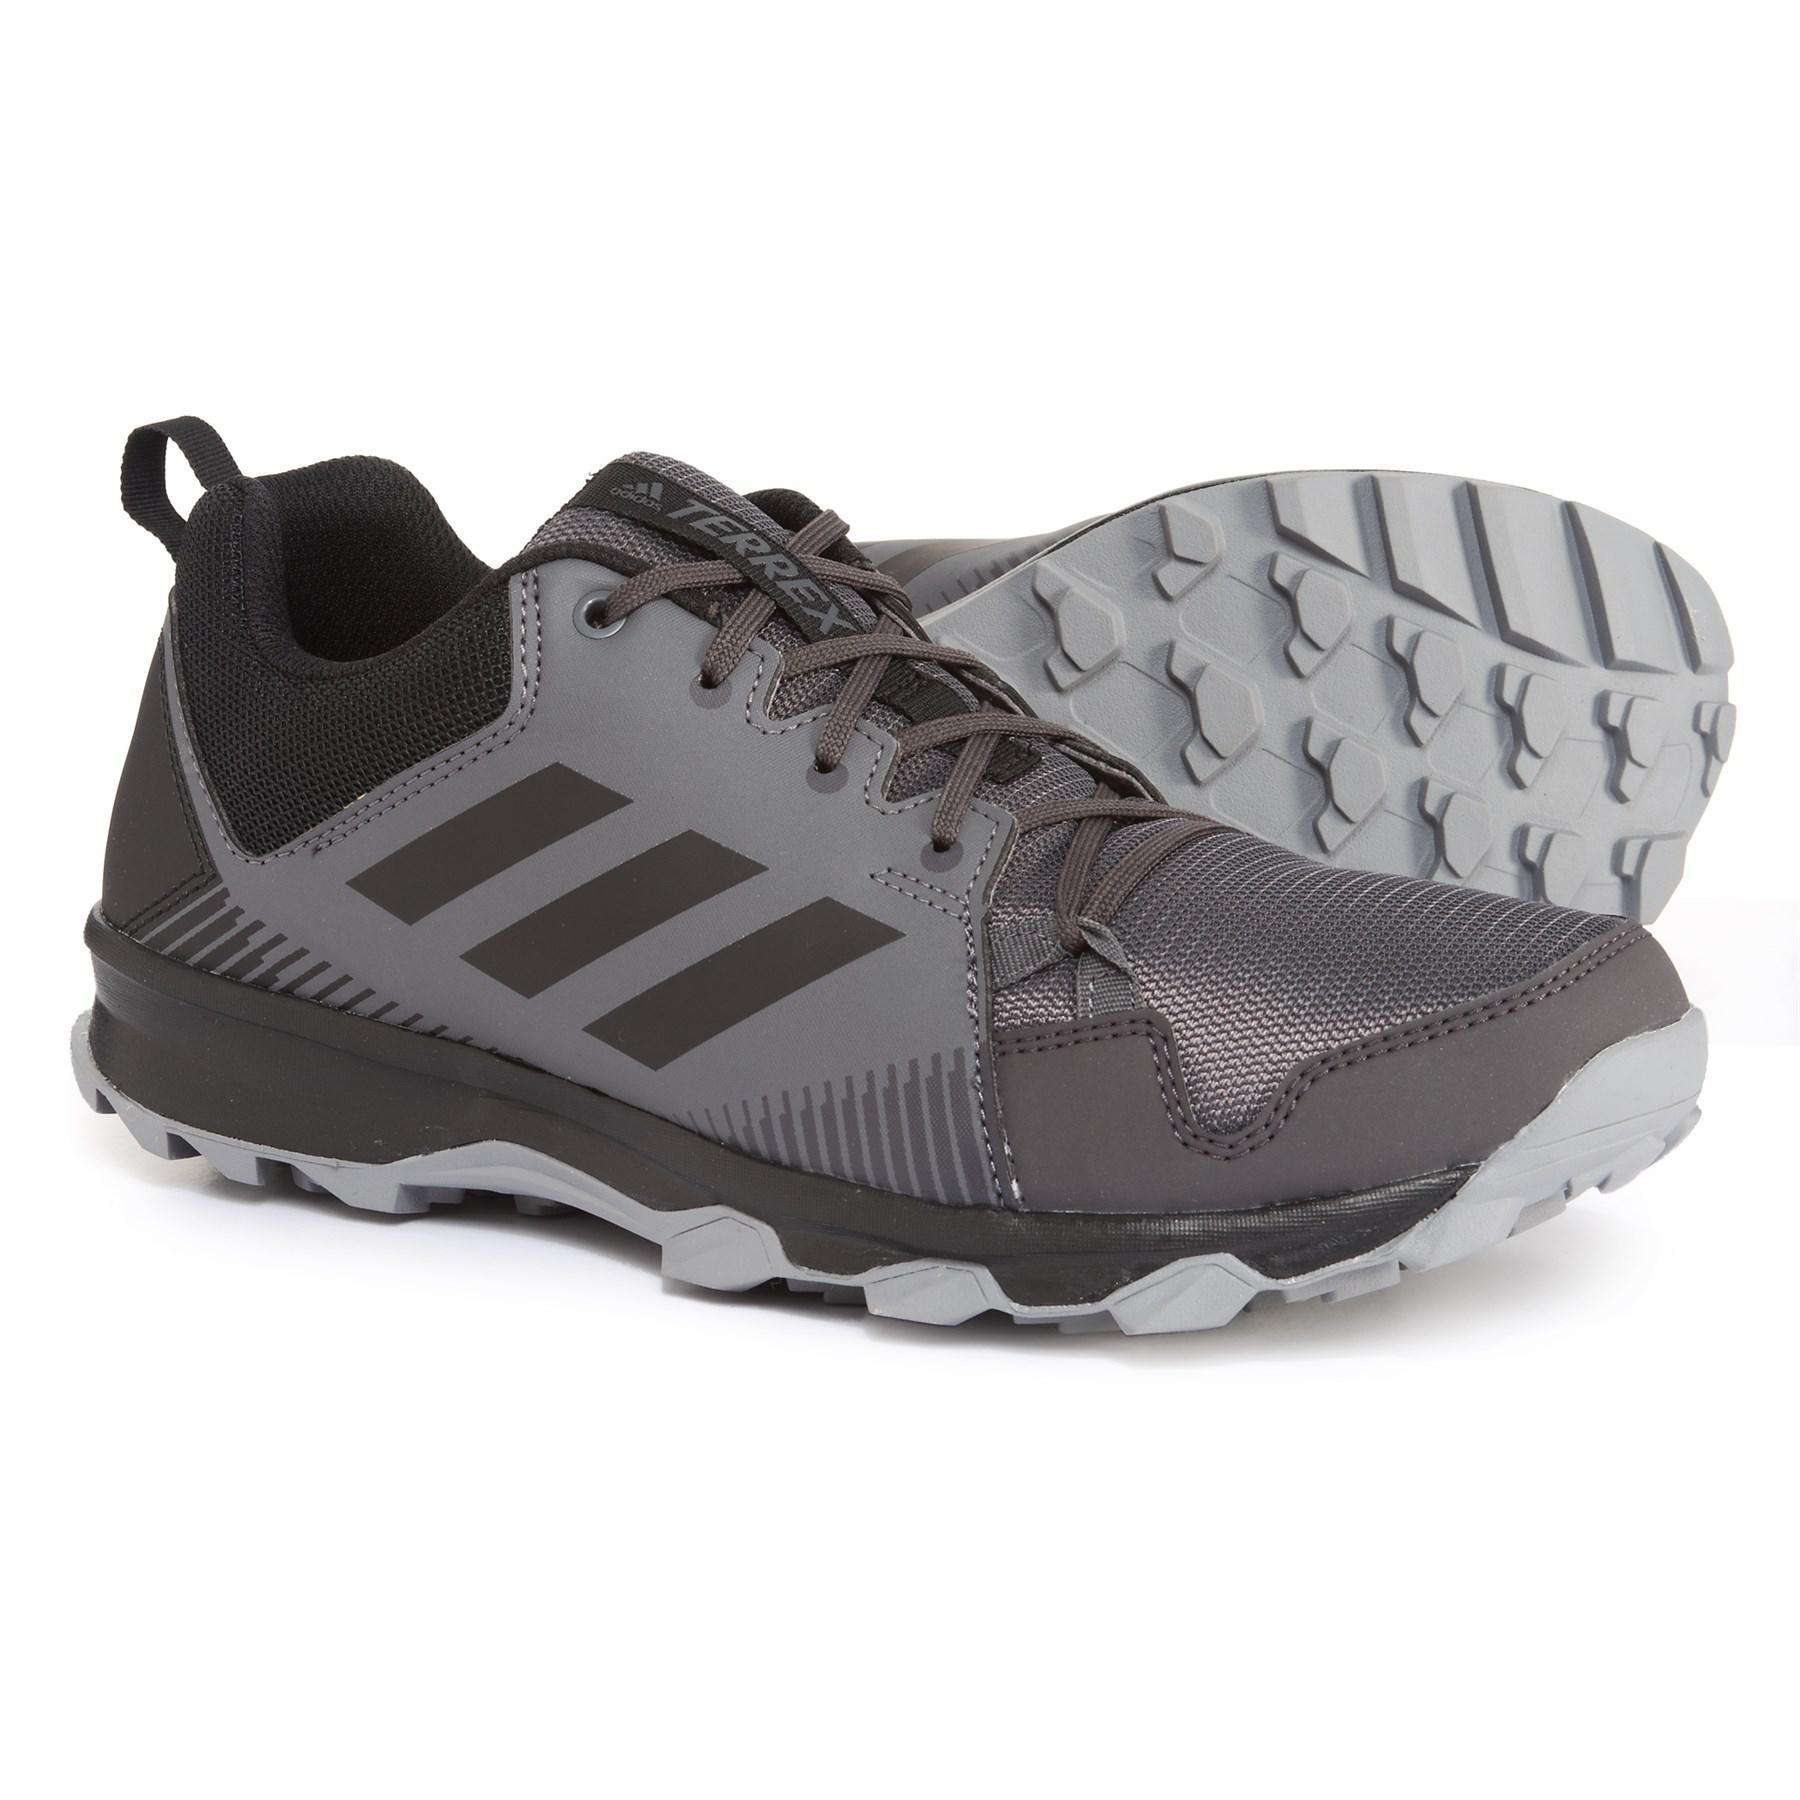 Lyst - Adidas Tracerocker Trail Running Shoes (for Women) in Black 326ac0ac8